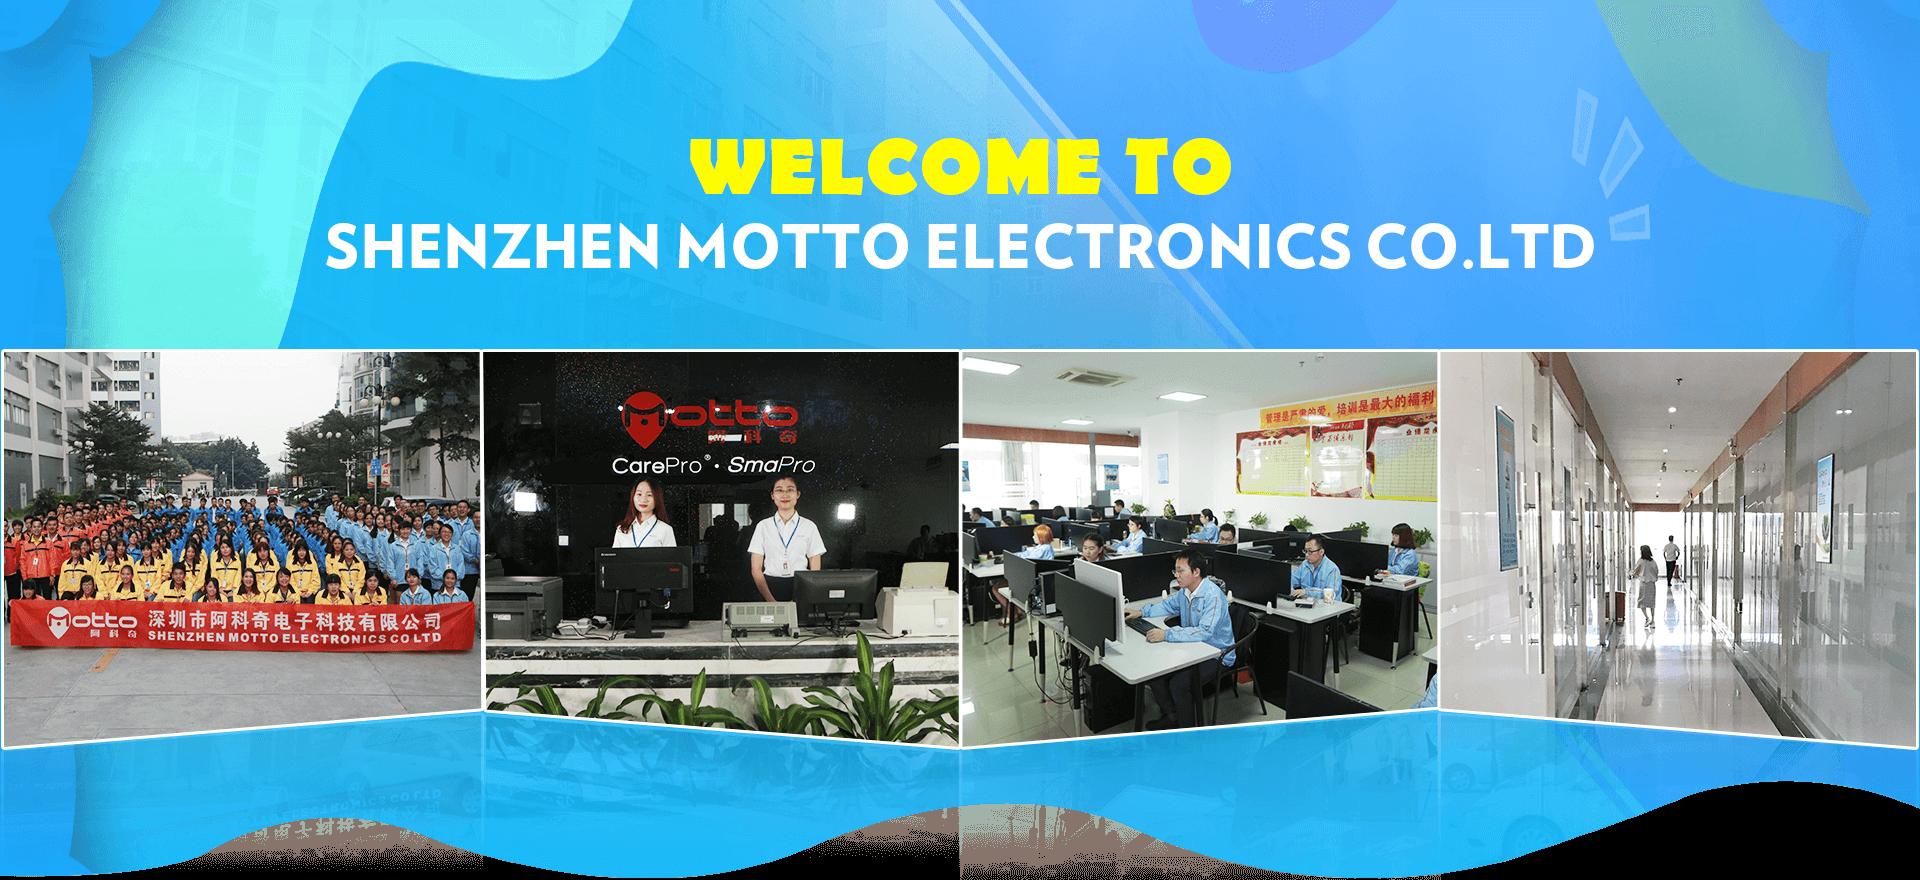 Shenzhen Motto Electronics Company